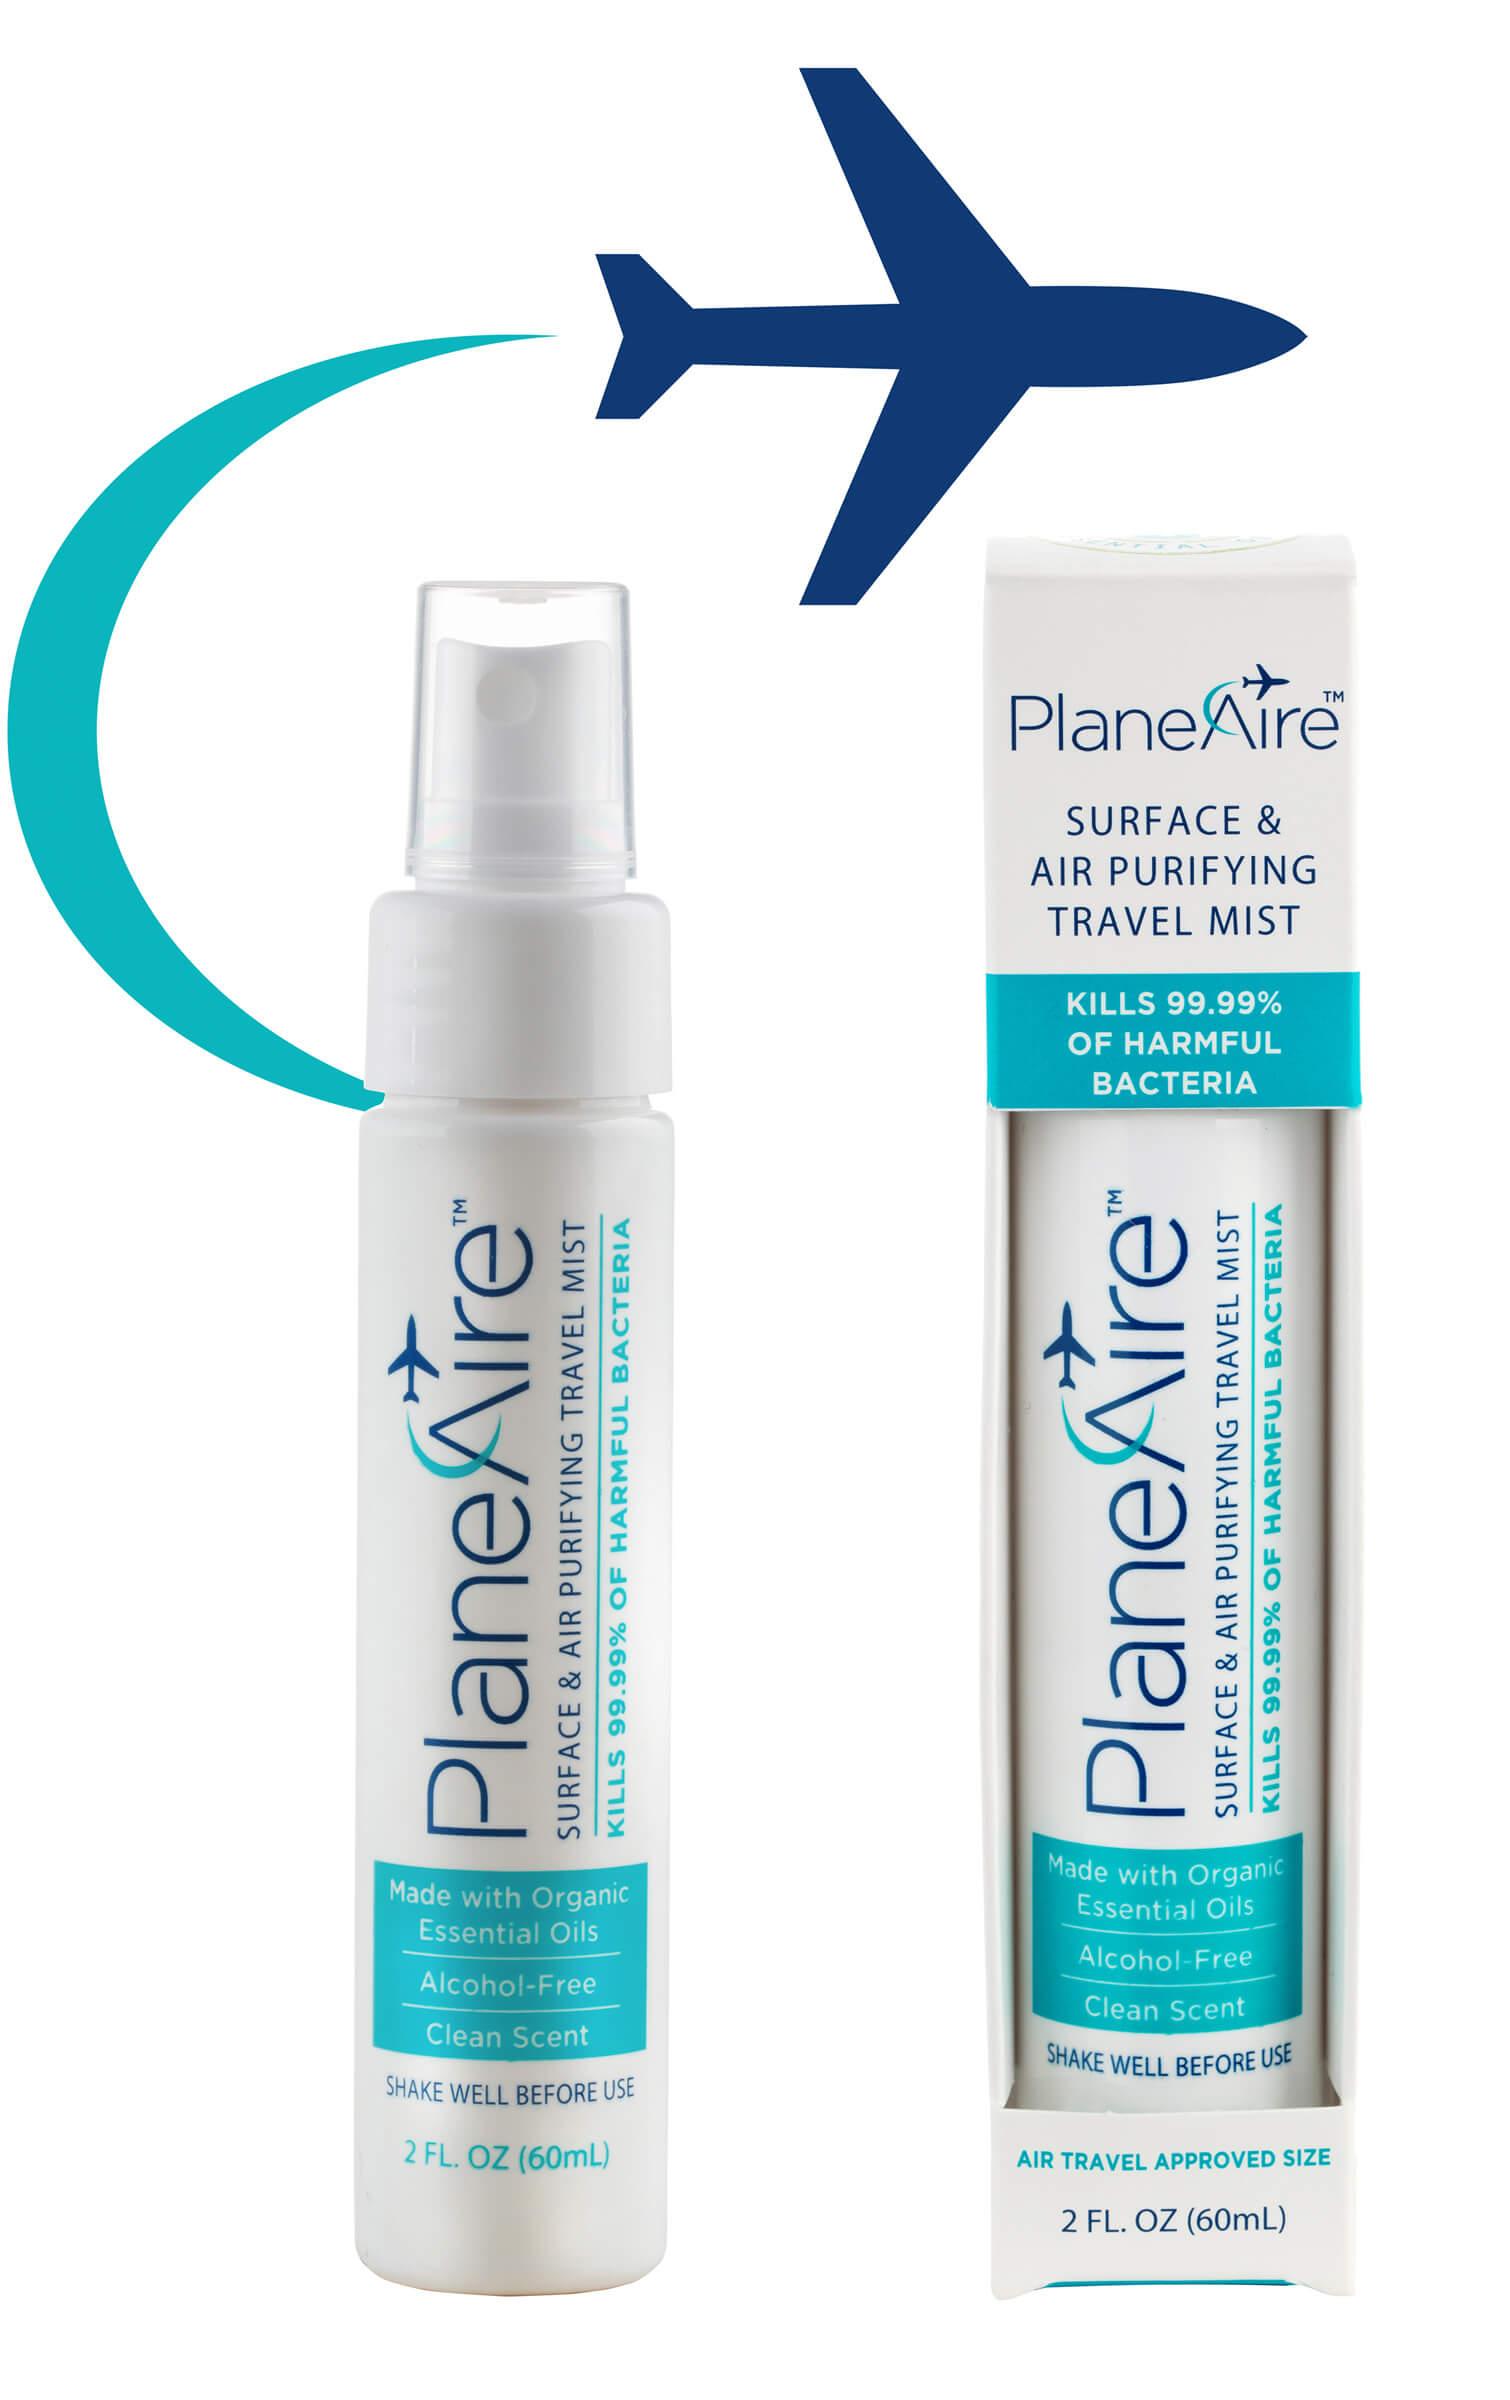 PlaneAire Travel Mist Antibacterial Spray for Travel